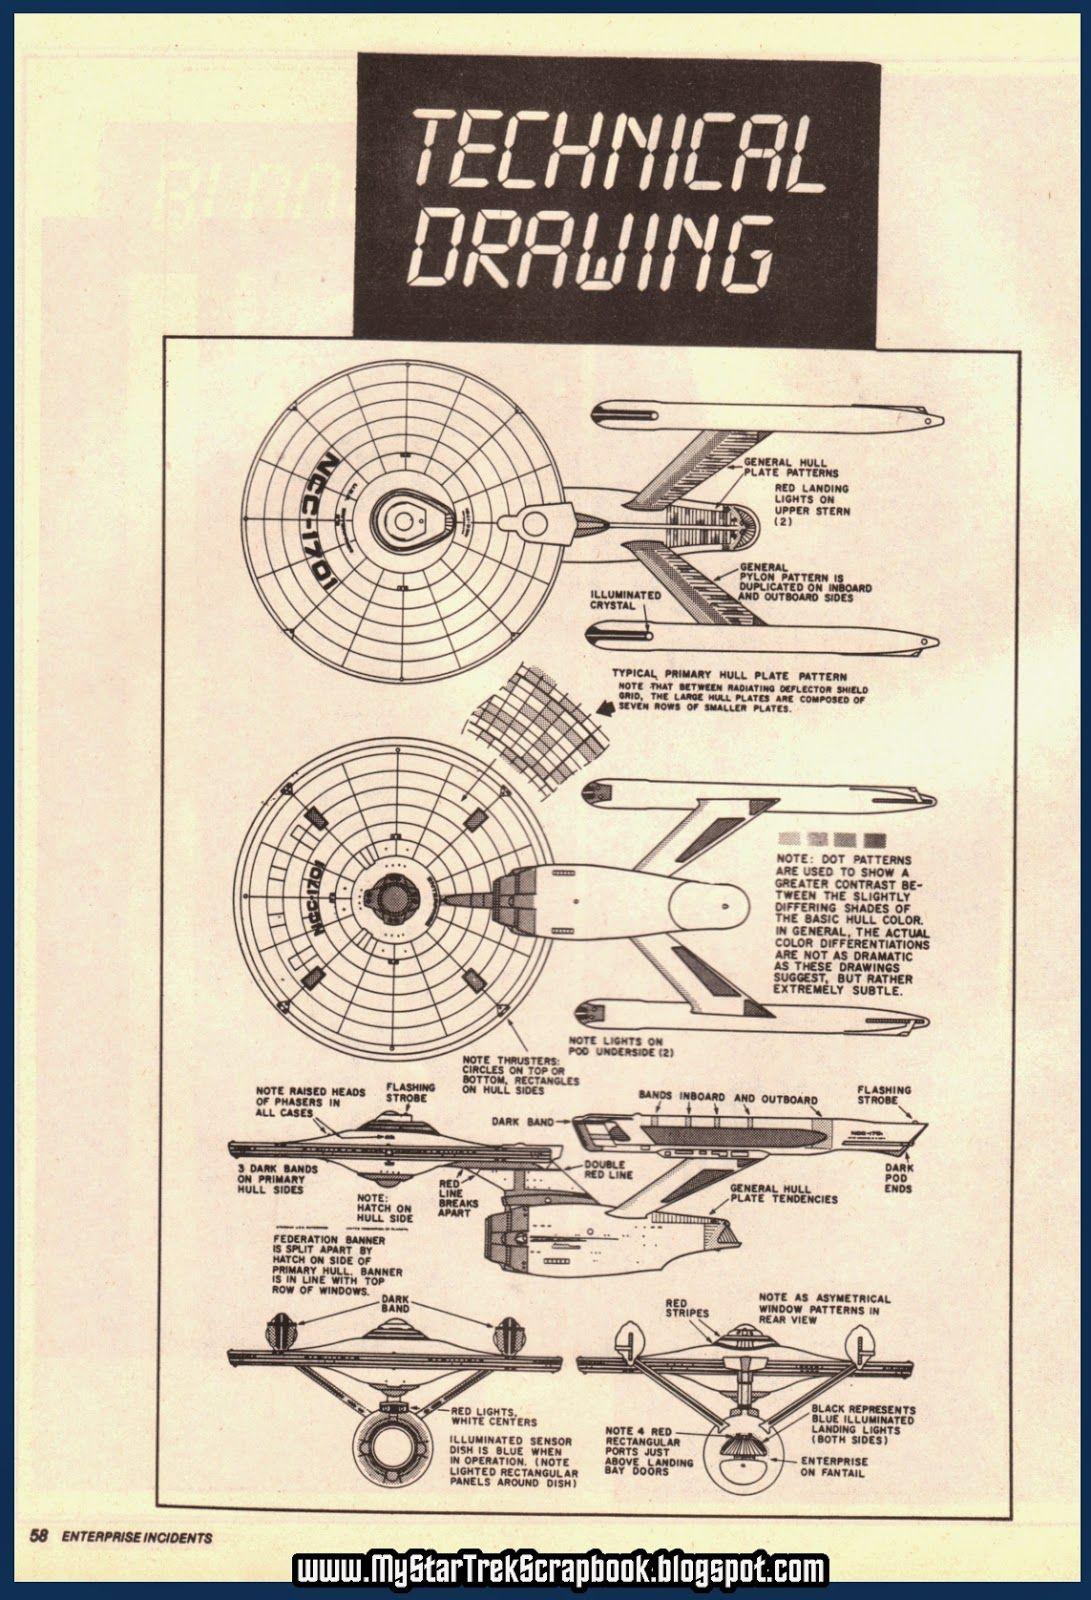 My Star Trek Scrapbook